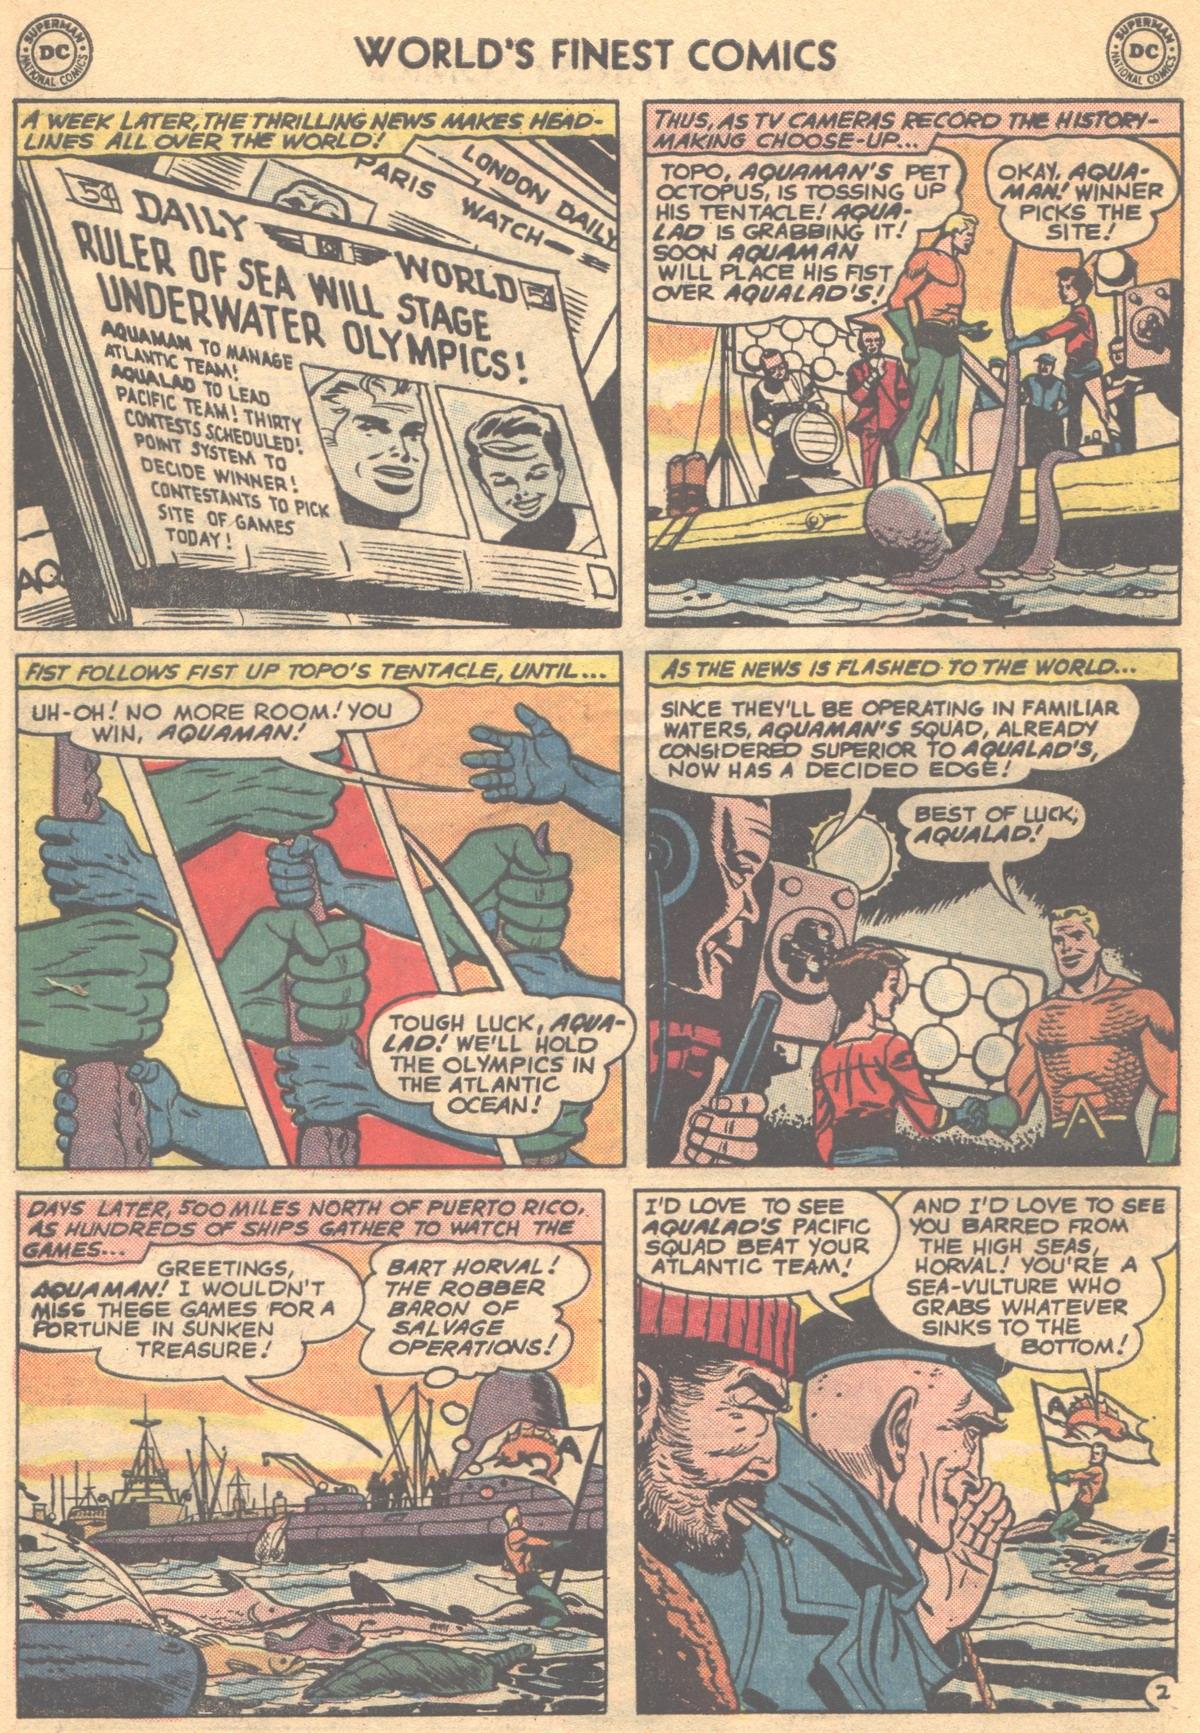 Read online World's Finest Comics comic -  Issue #147 - 26